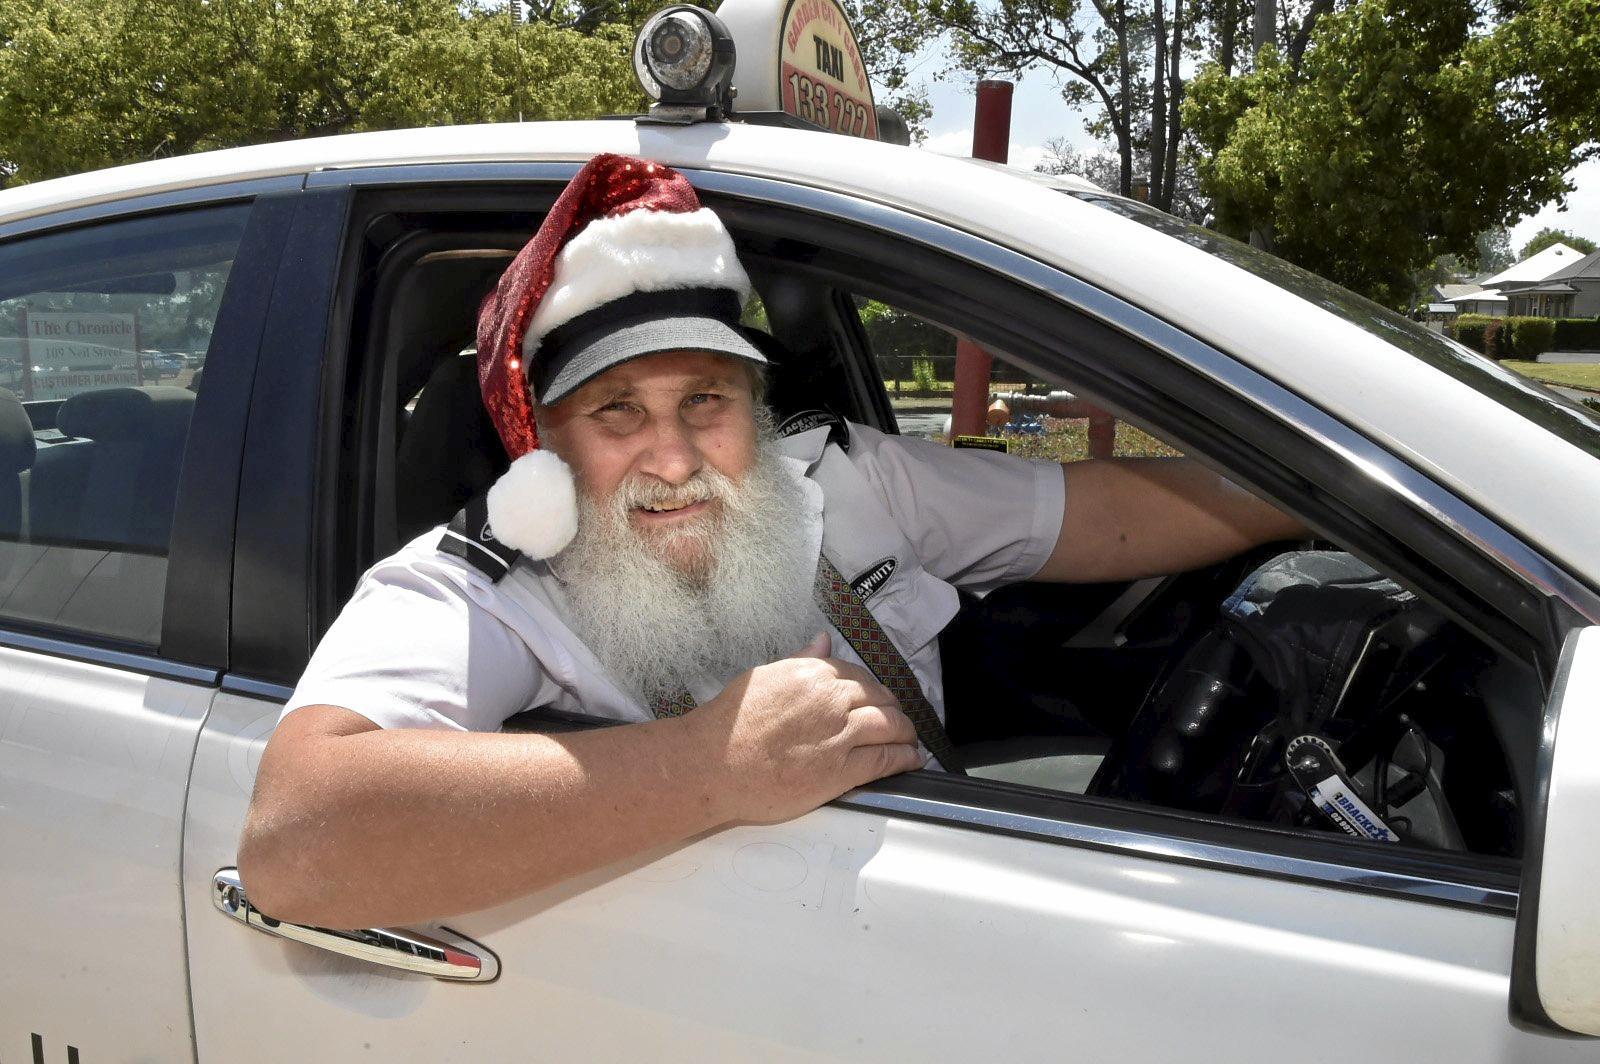 Santa cab driver, Kevin Eden. November 2018